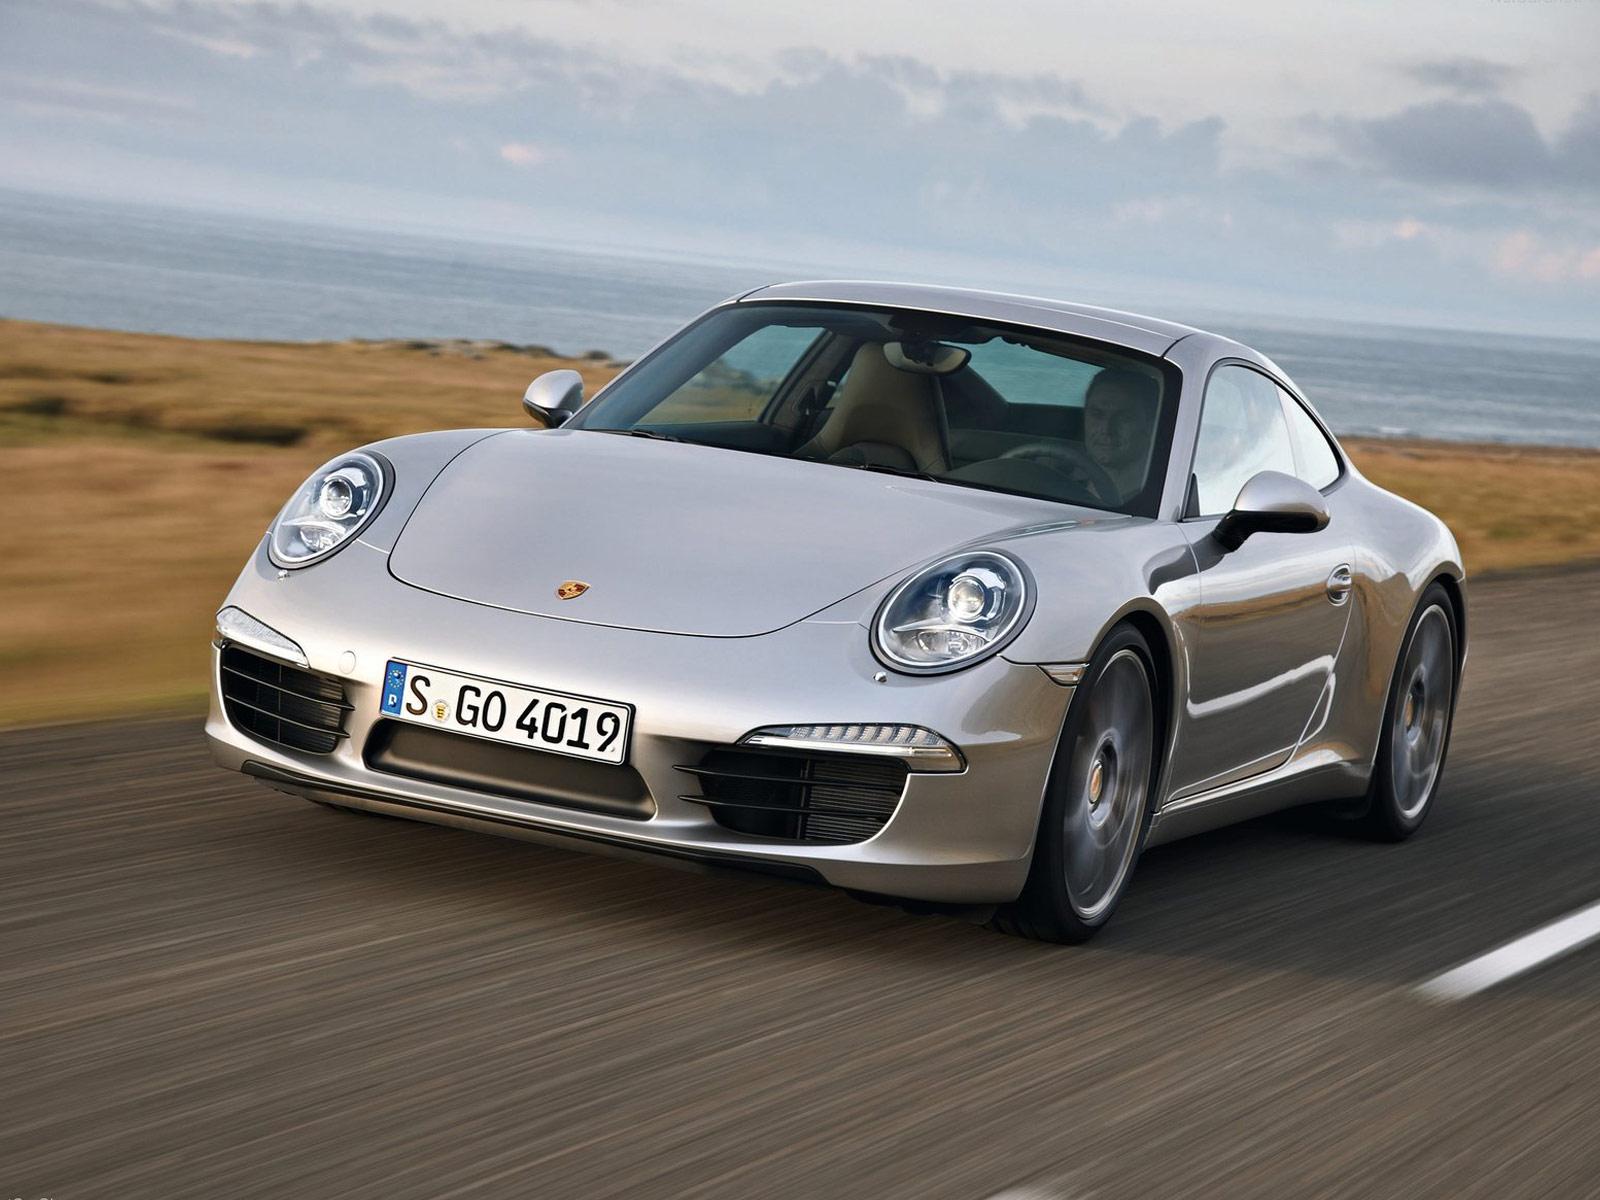 2013 porsche 911 carrera s car desktop wallpaper - Porsche 911 carrera s wallpaper ...